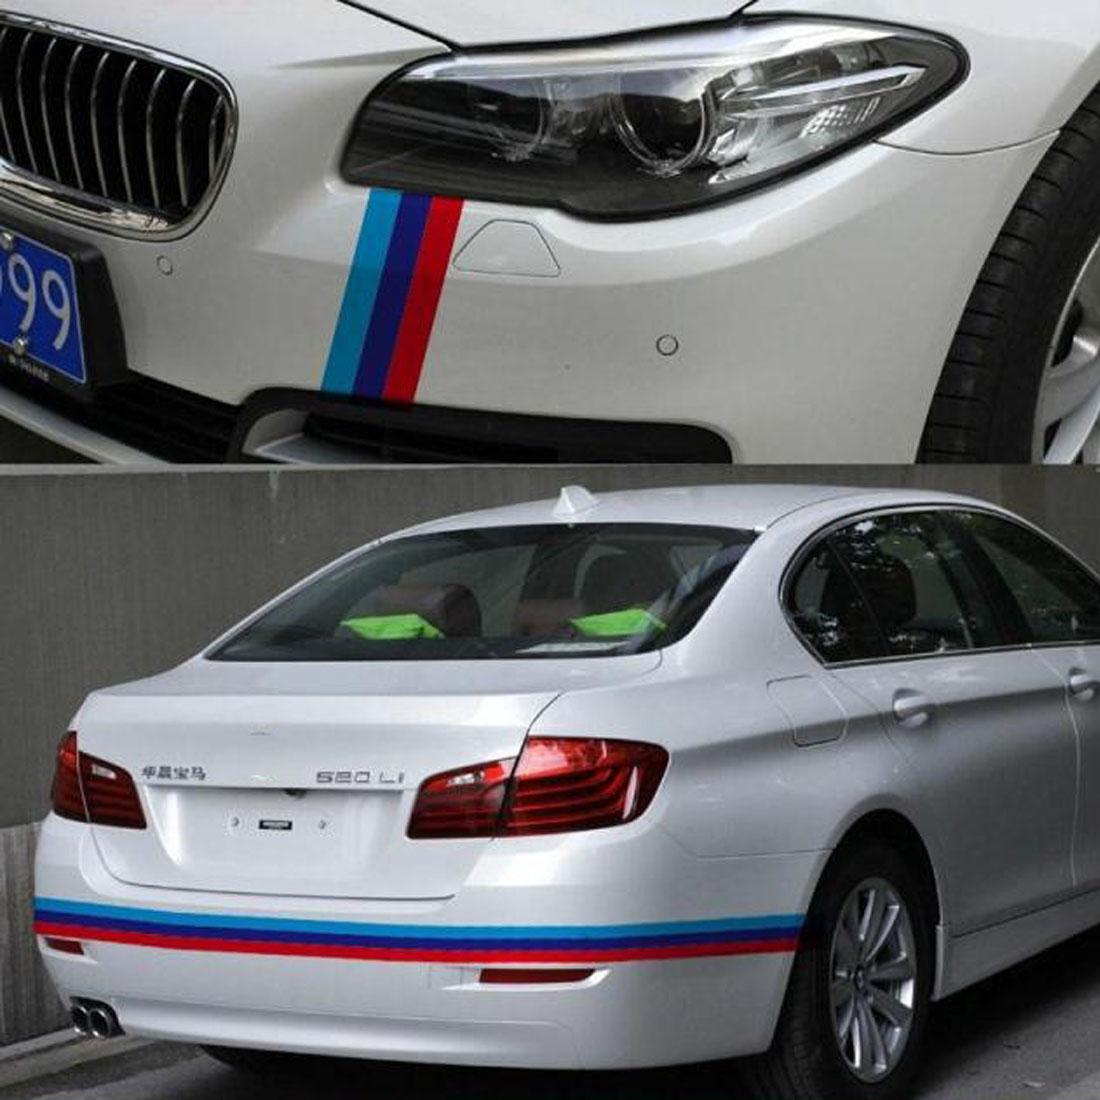 Bmw Z4 Emblem Replacement: Auto 3M Car Cover Mat Sticker For BMW E46 X1 X3 X5 X6 E39